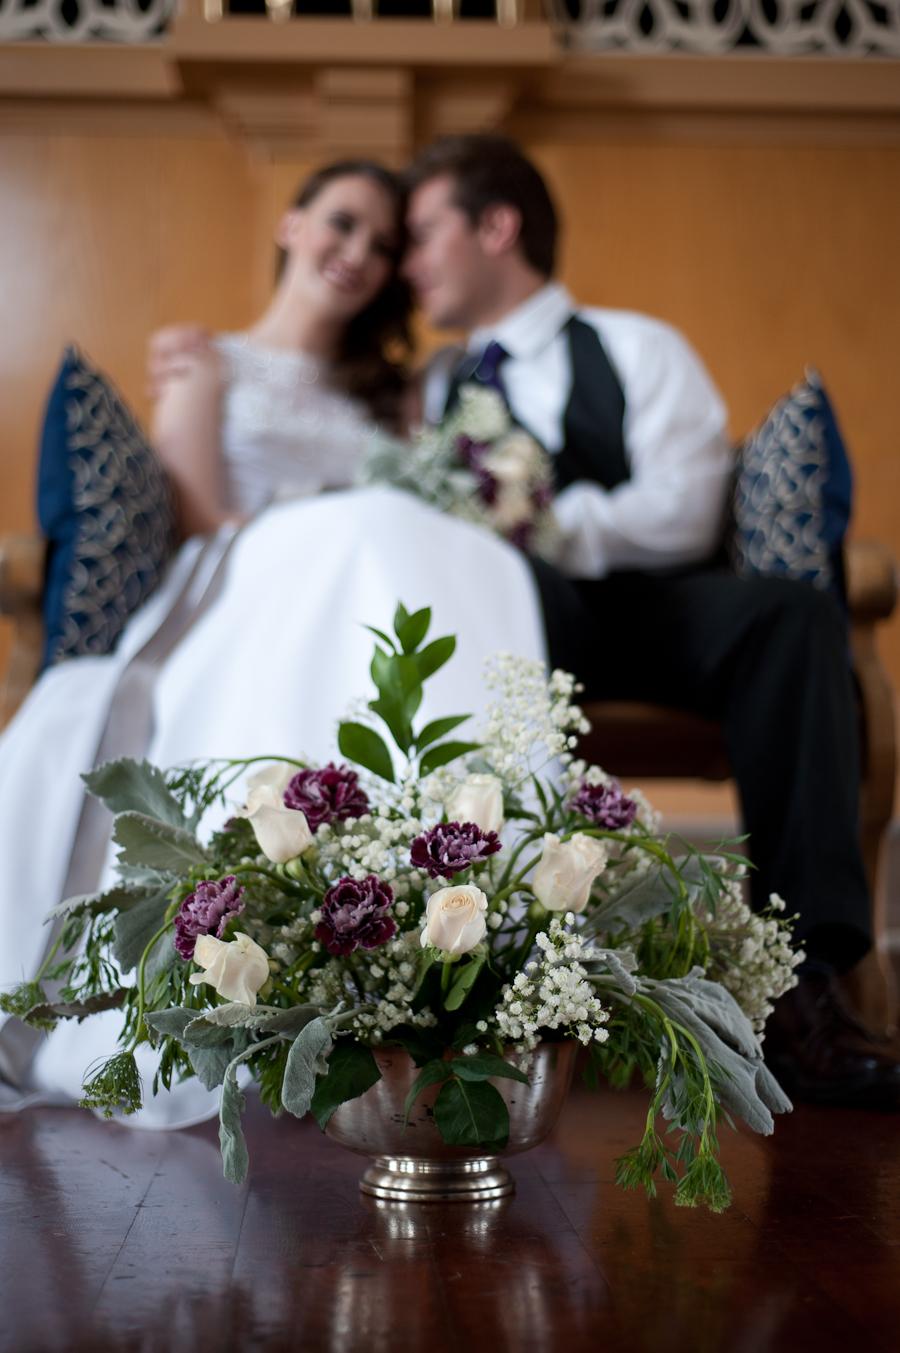 Susannah_Deangelo_Antique_Silver_Music_Hall_Wedding-24.jpg